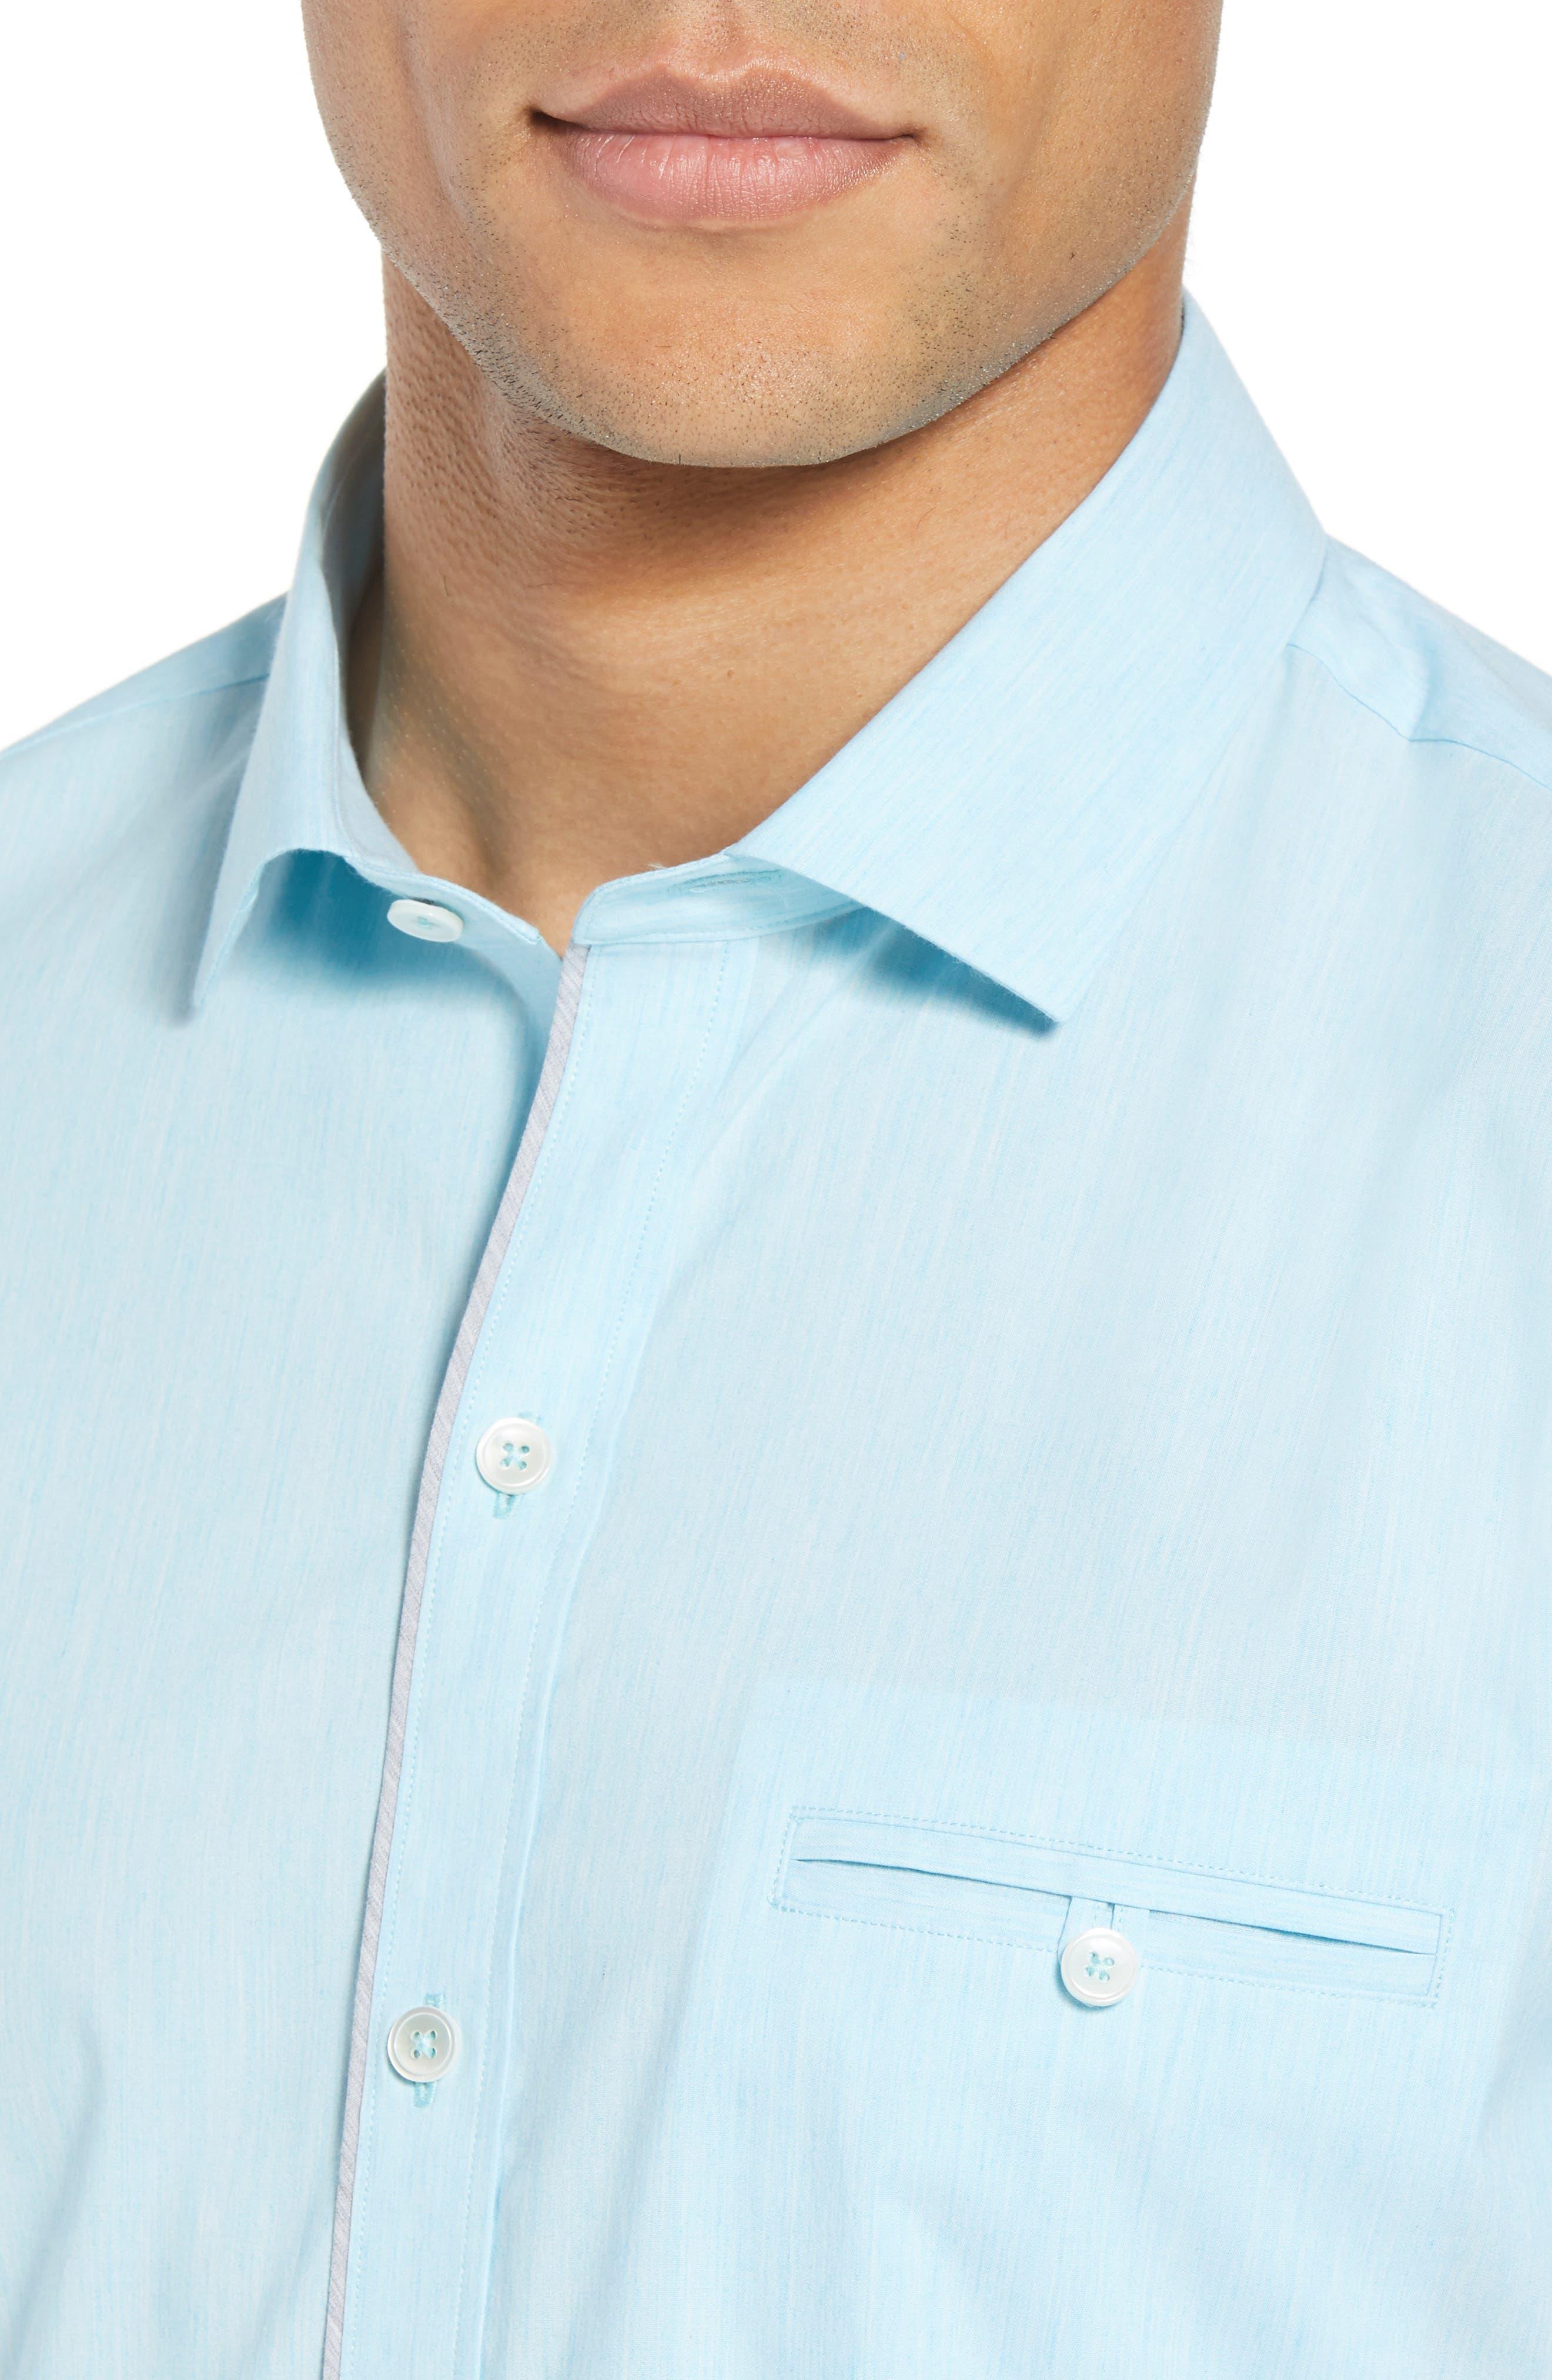 Baumann Slim Fit Sport Shirt,                             Alternate thumbnail 4, color,                             Aqua